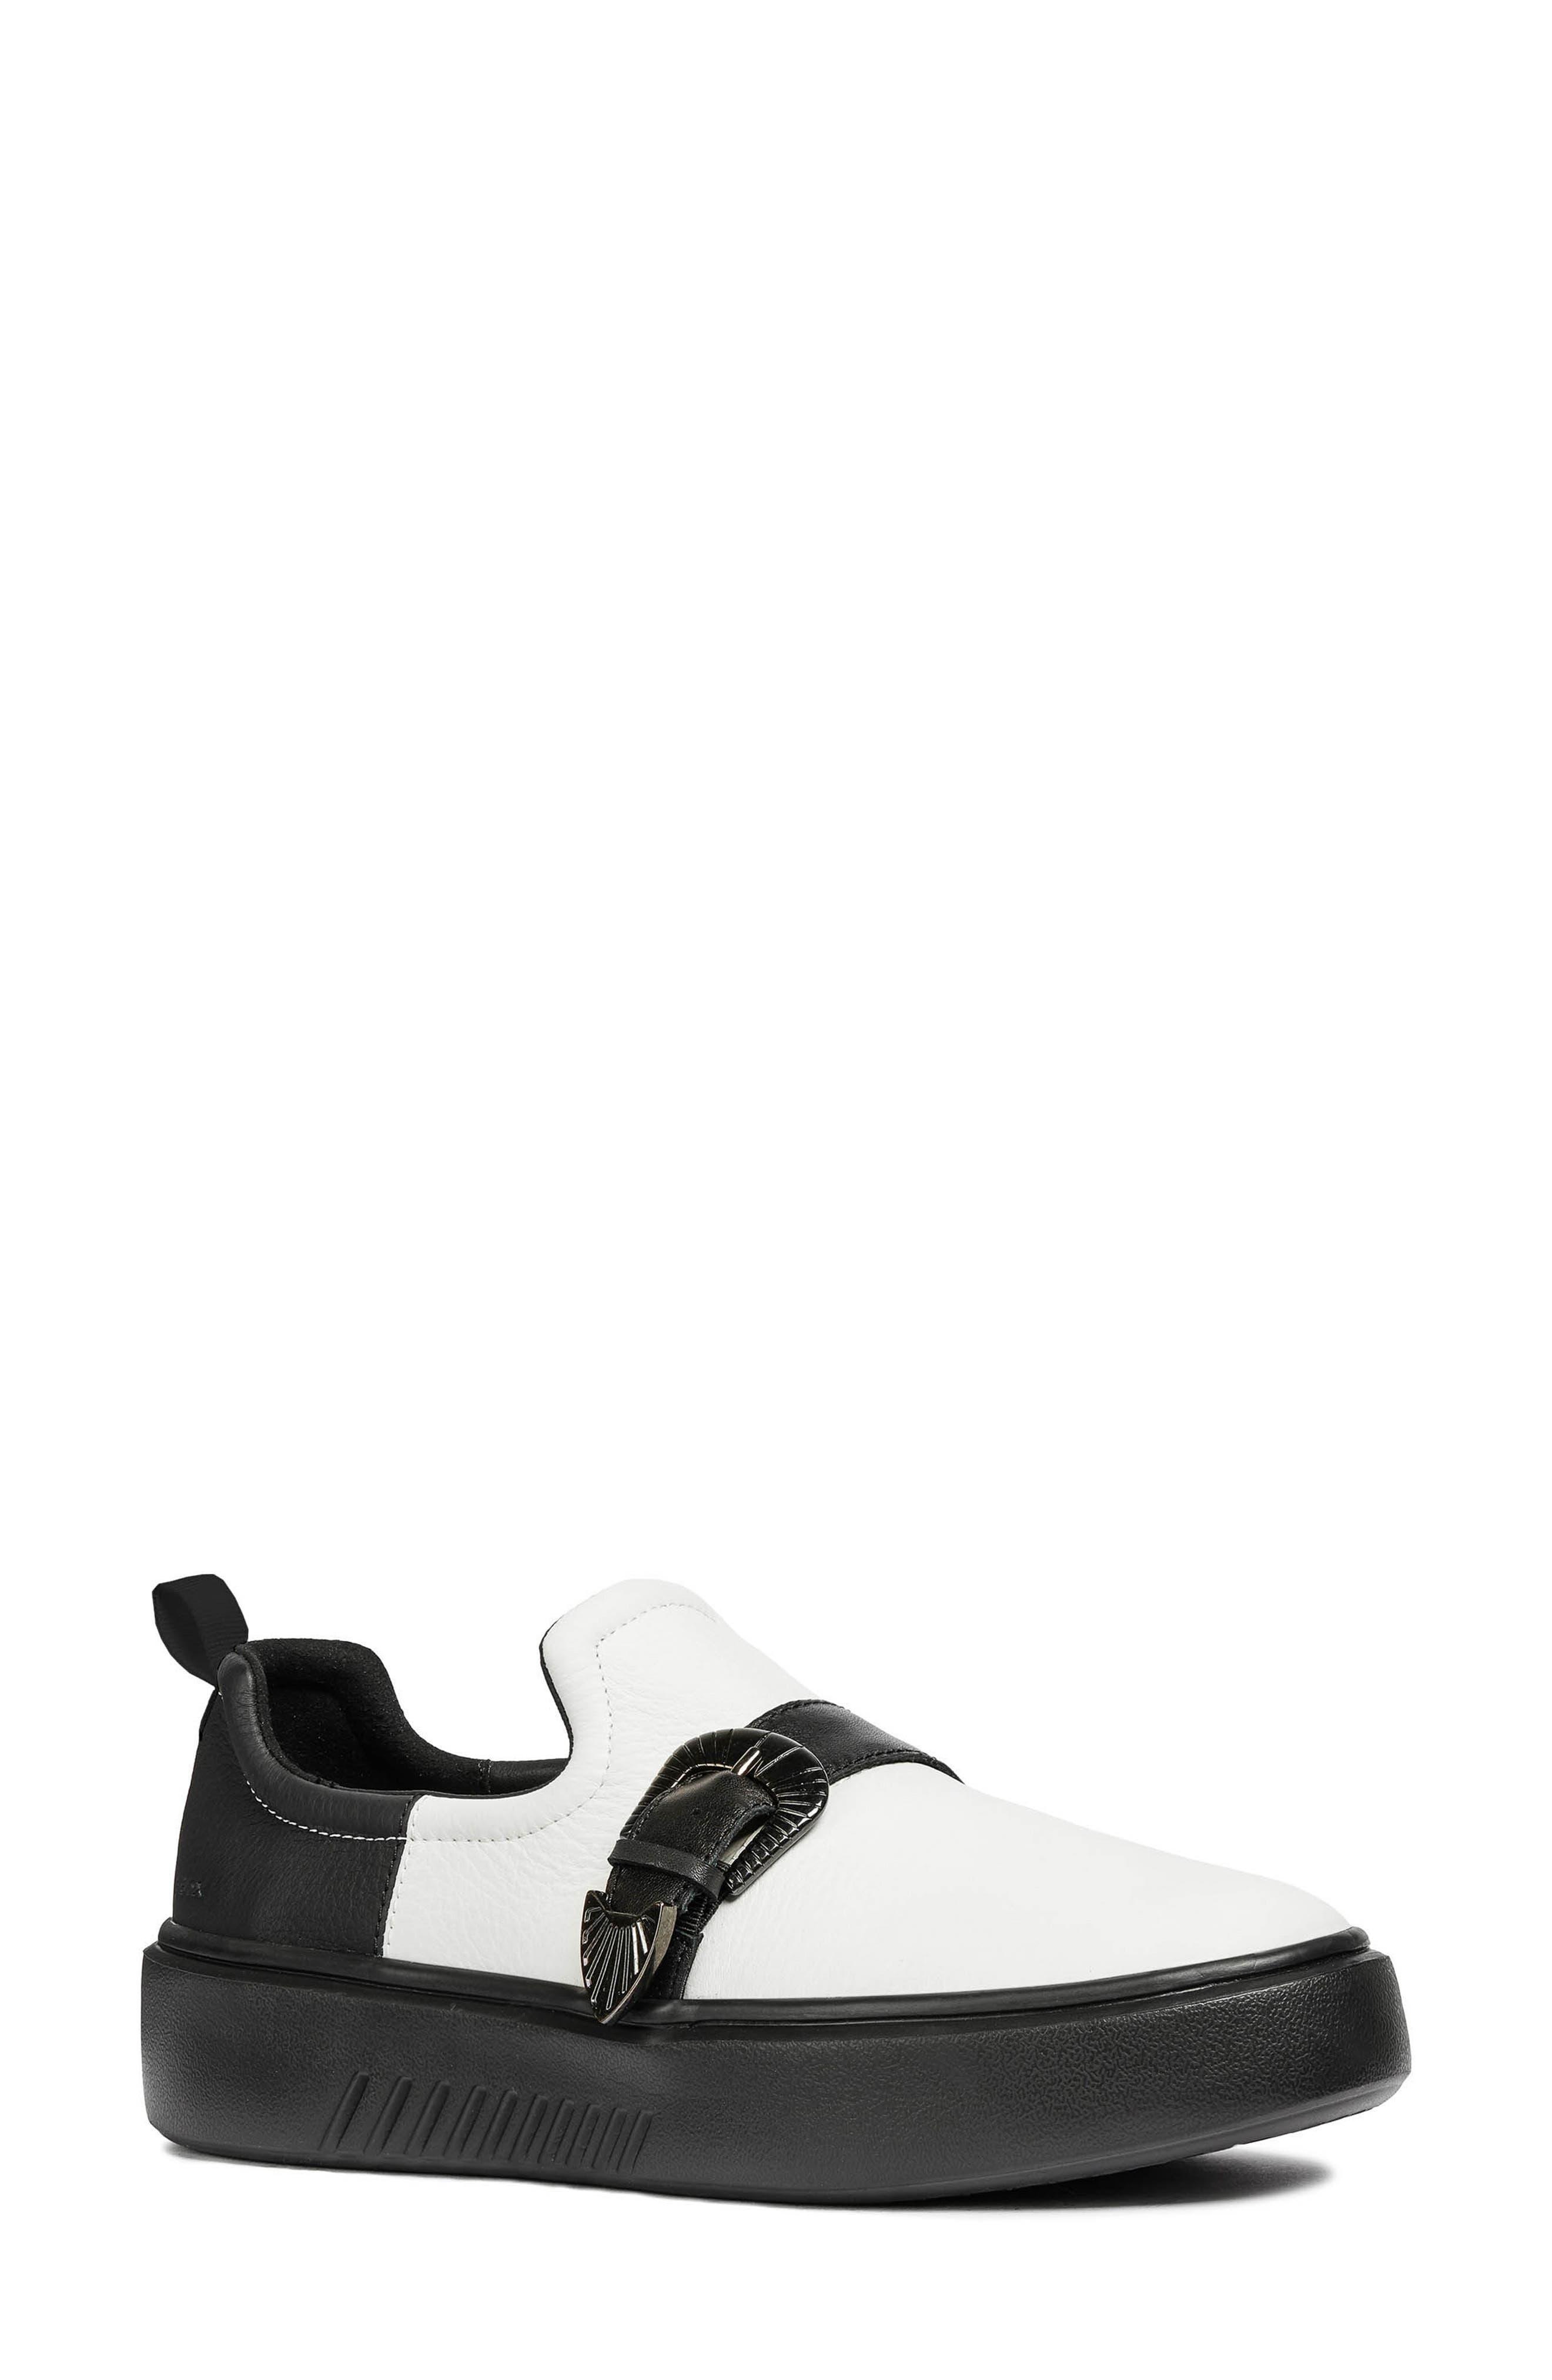 Nhenbus Platform Sneaker,                             Main thumbnail 1, color,                             WHITE/ BLACK LEATHER